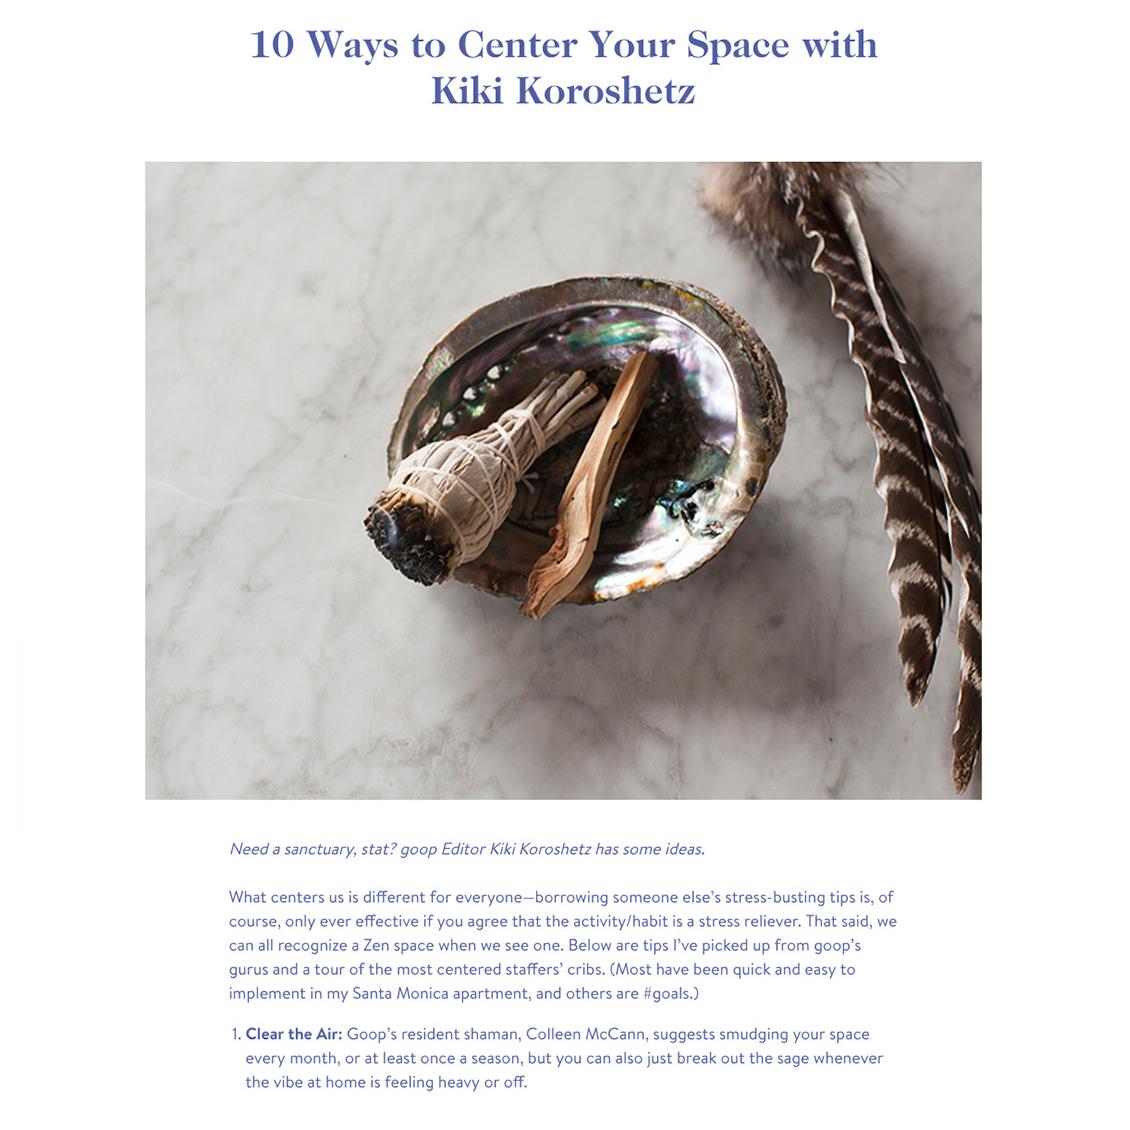 centering_space_thumb.jpg